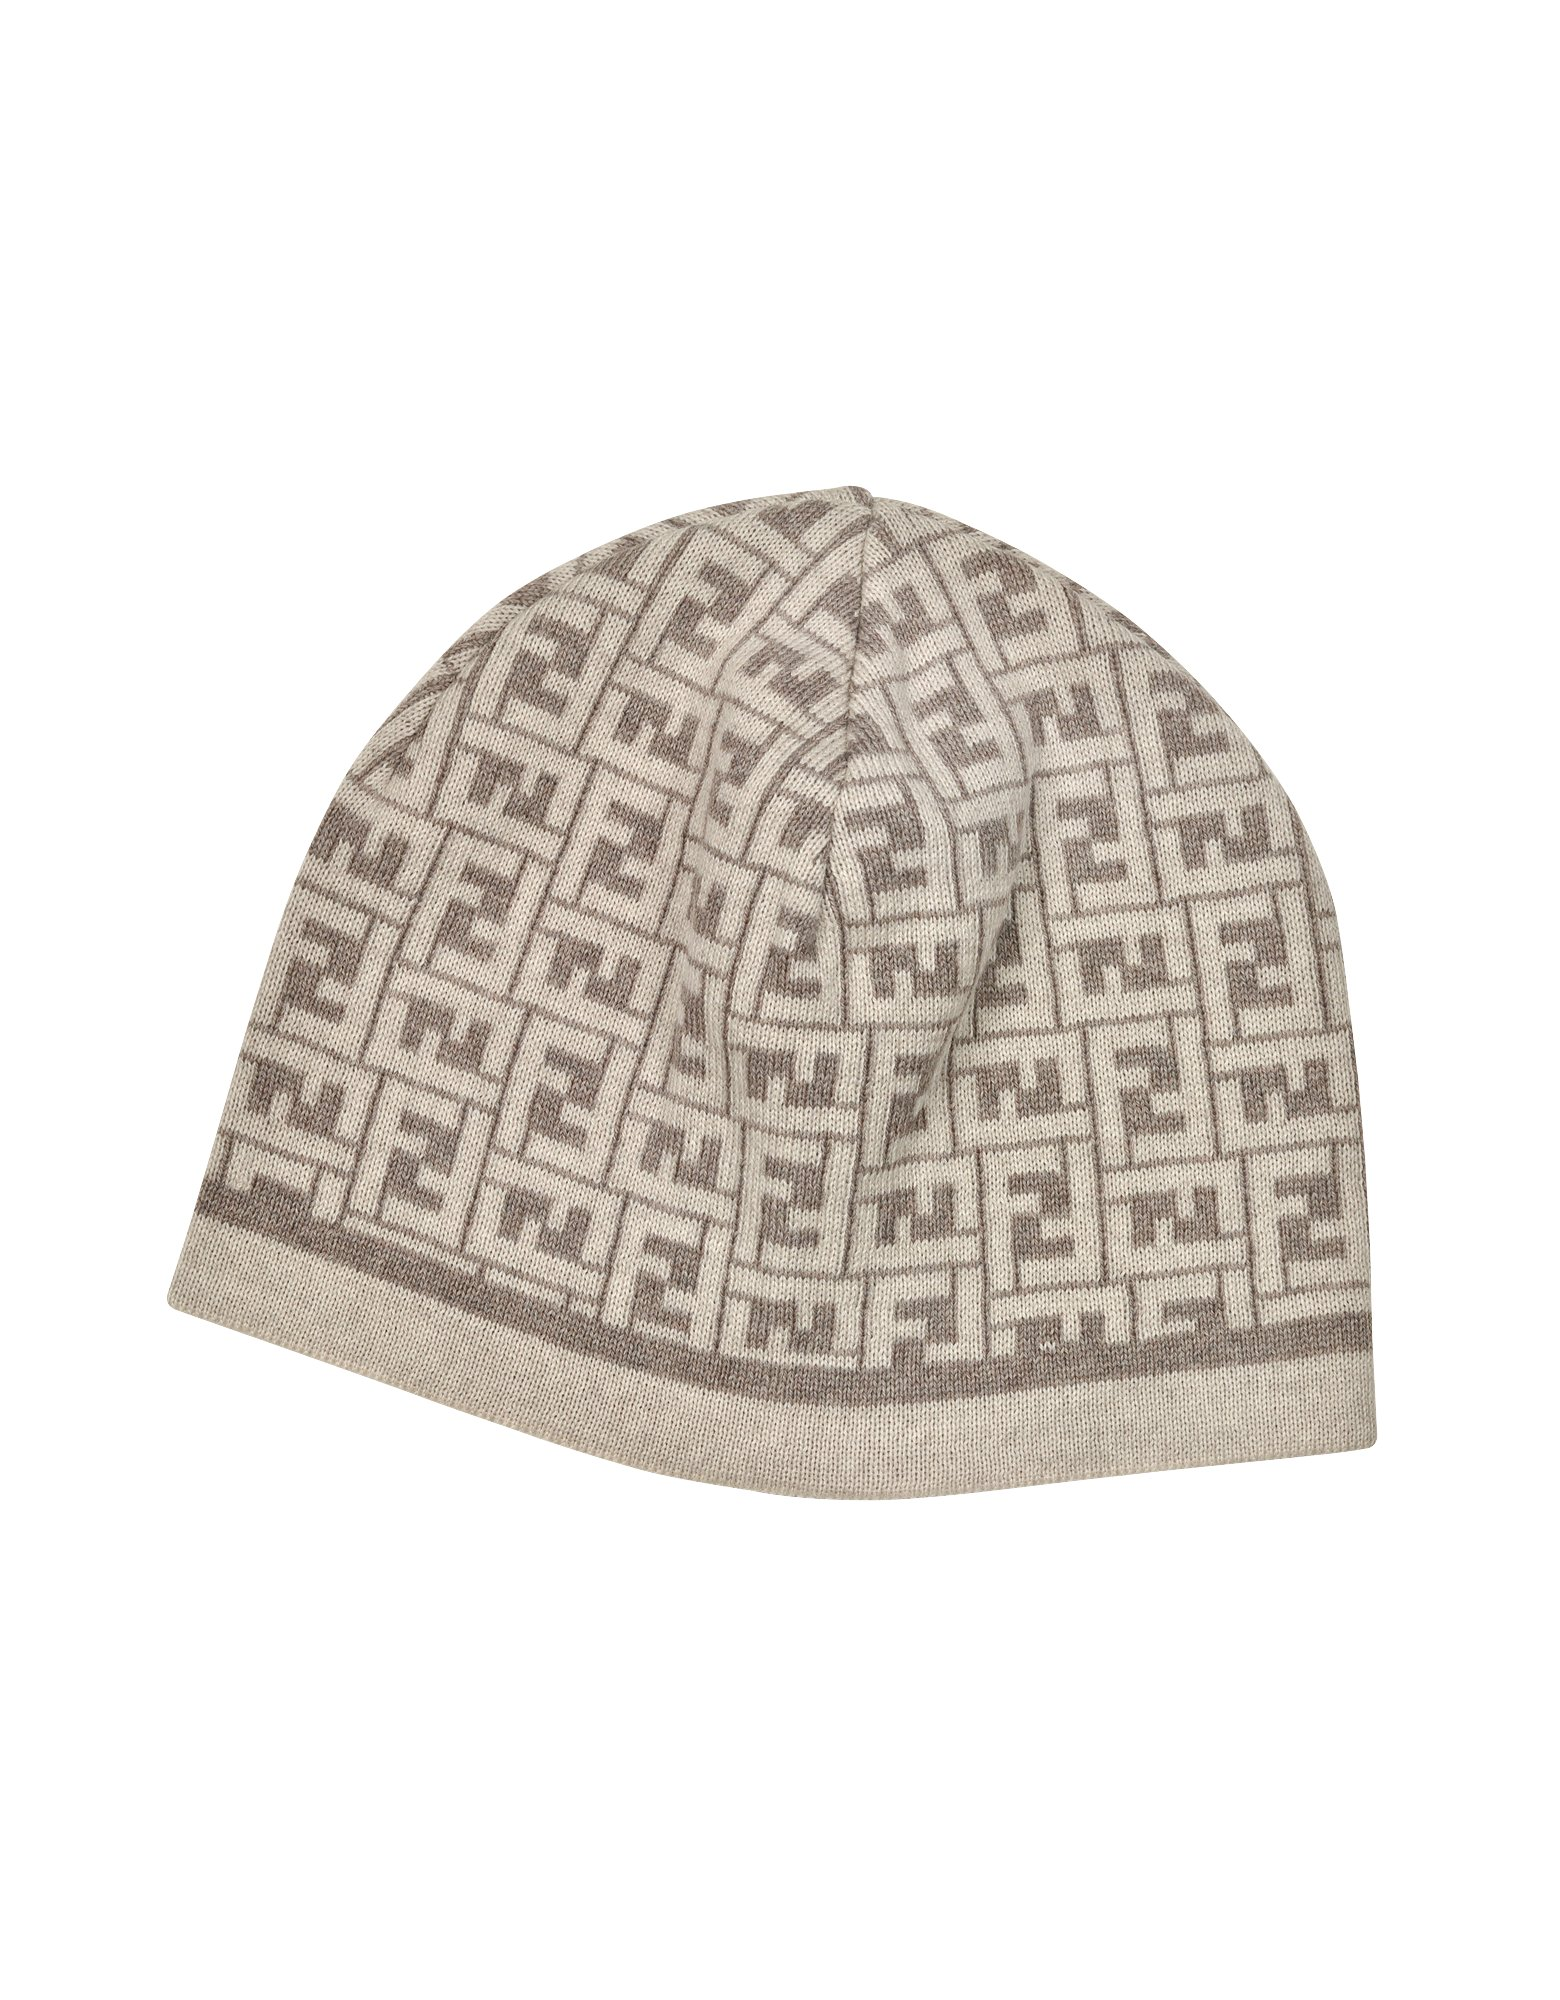 2c4325c0fb9 Lyst - Fendi All Over Zucca Logo Knit Wool Skull Cap in Brown